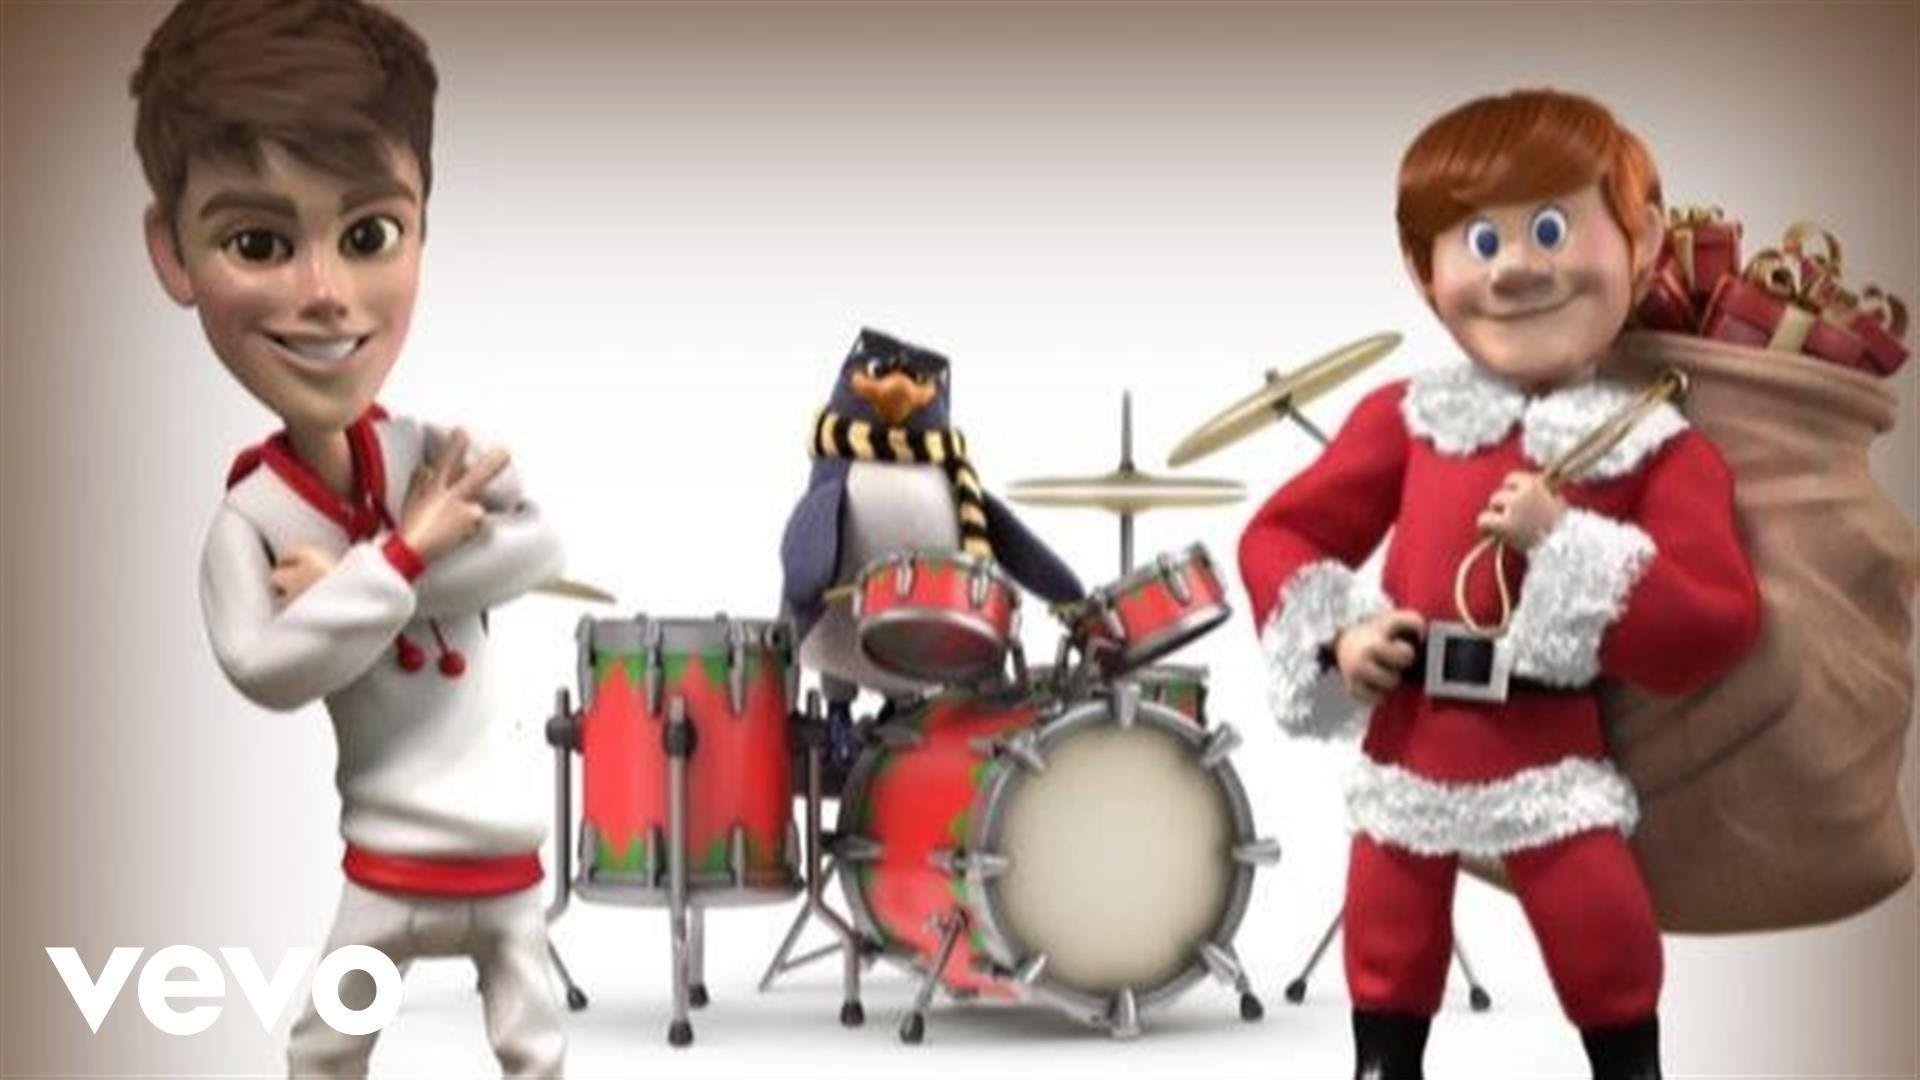 Justin Bieber Santa claus is coming to town, Justin